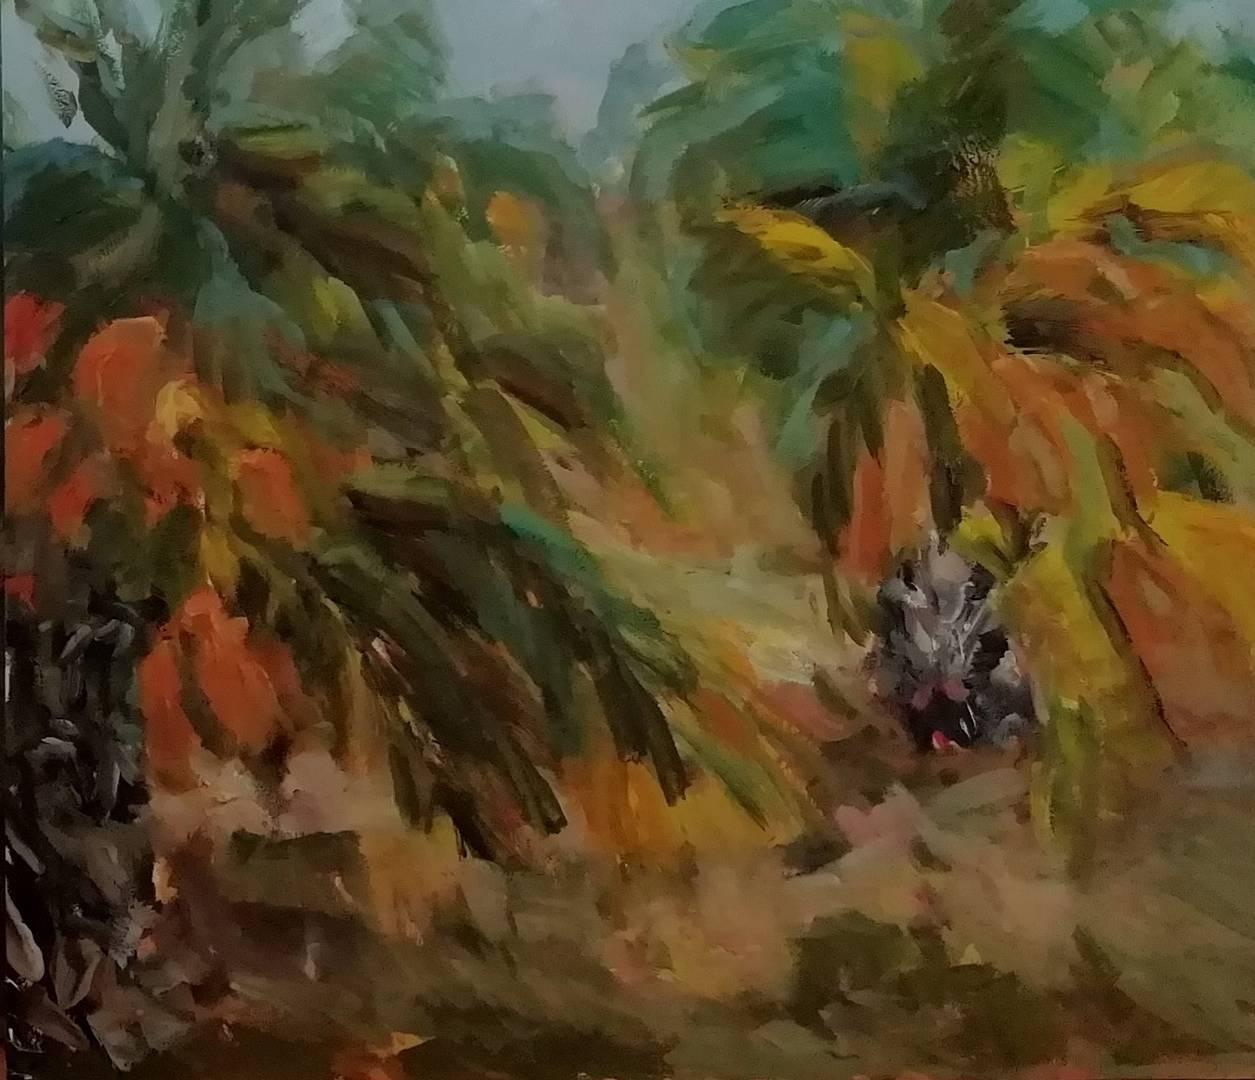 Пальмы парами. Грунтованный картон, масло. 40 х 40.